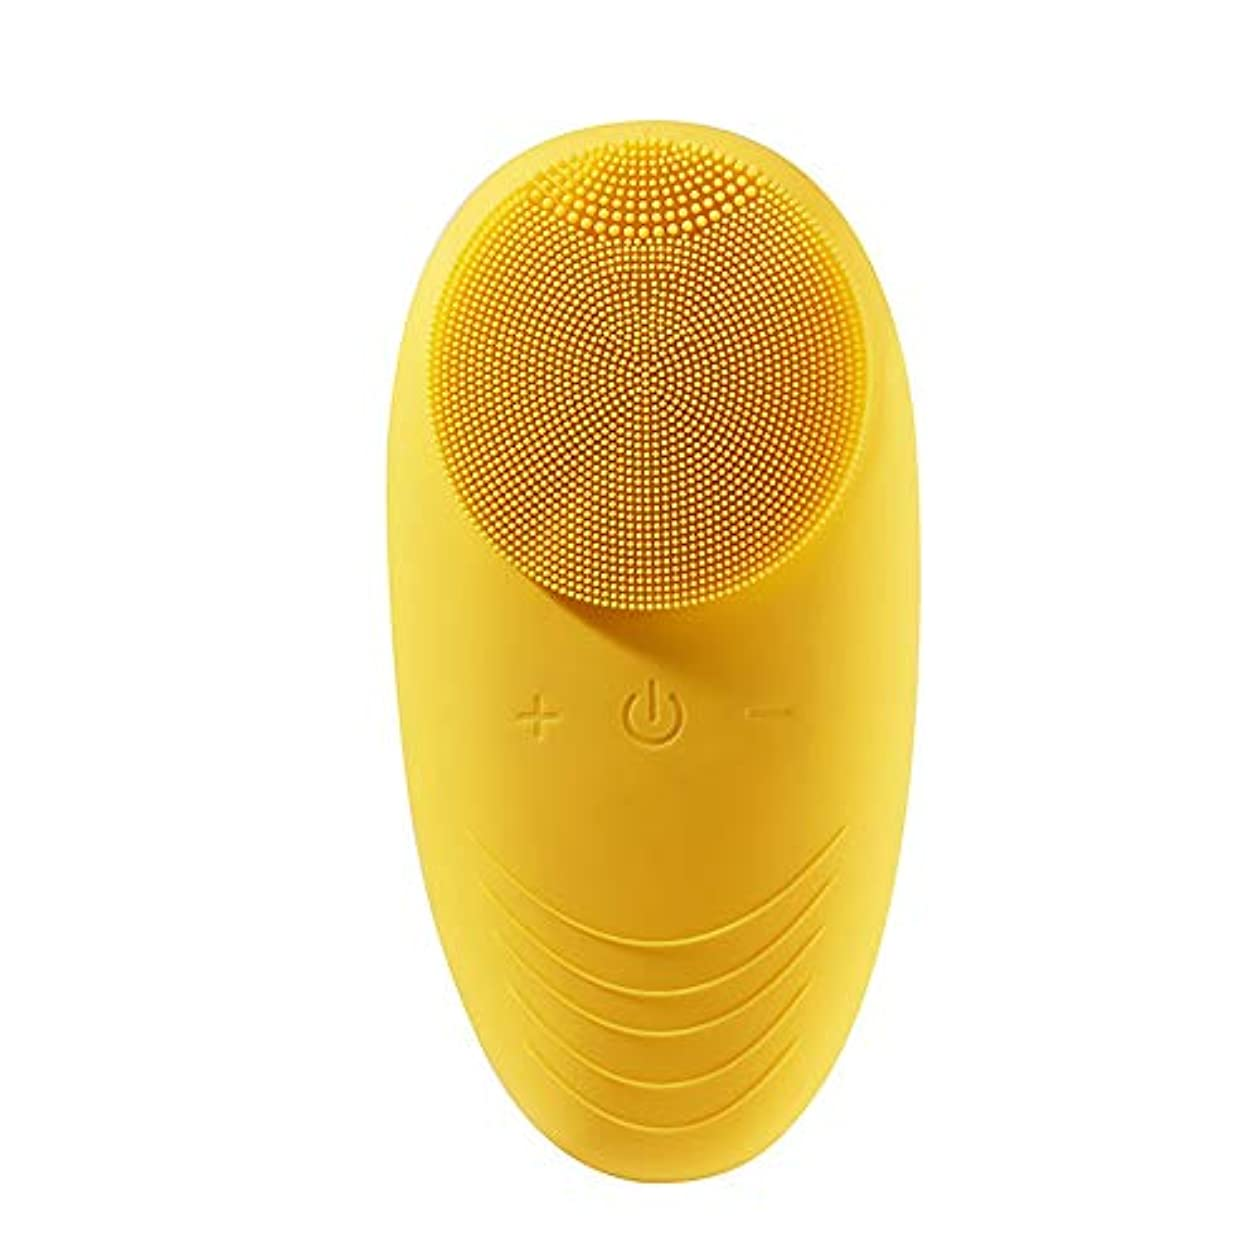 ZXF 電気シリコーン防水クレンジングブラシディープクリーニングポア超音波振動クレンジング器具美容器具 滑らかである (色 : Yellow)